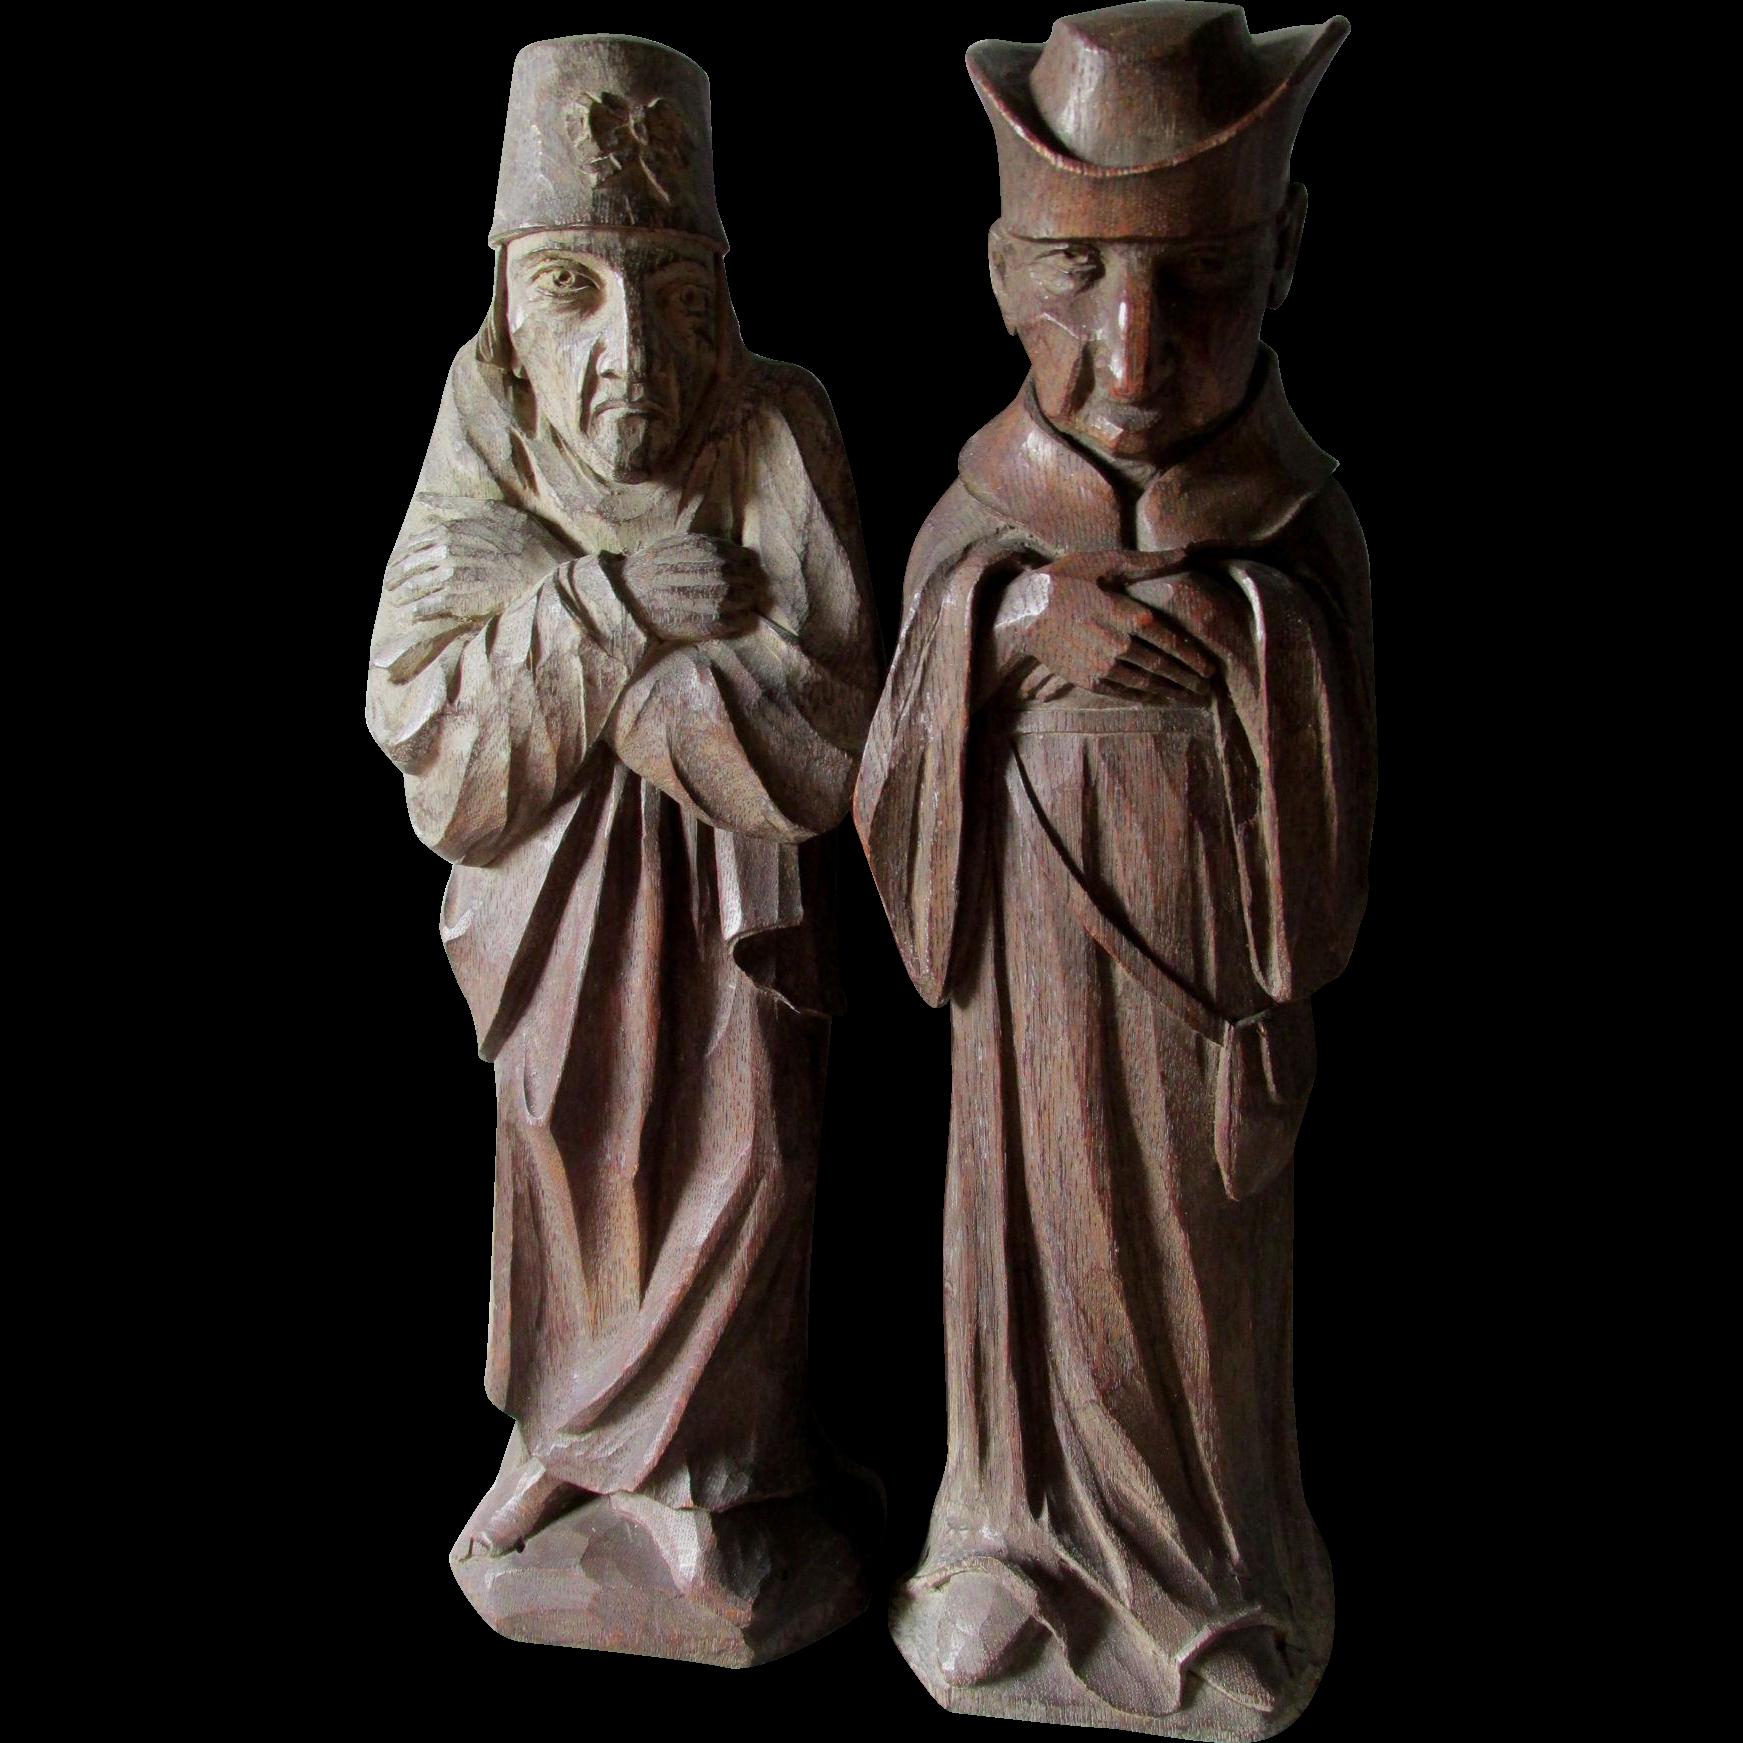 2 Vintage Hand Carved Wood Sculptures of a Monk & Scholar, European Folk Art